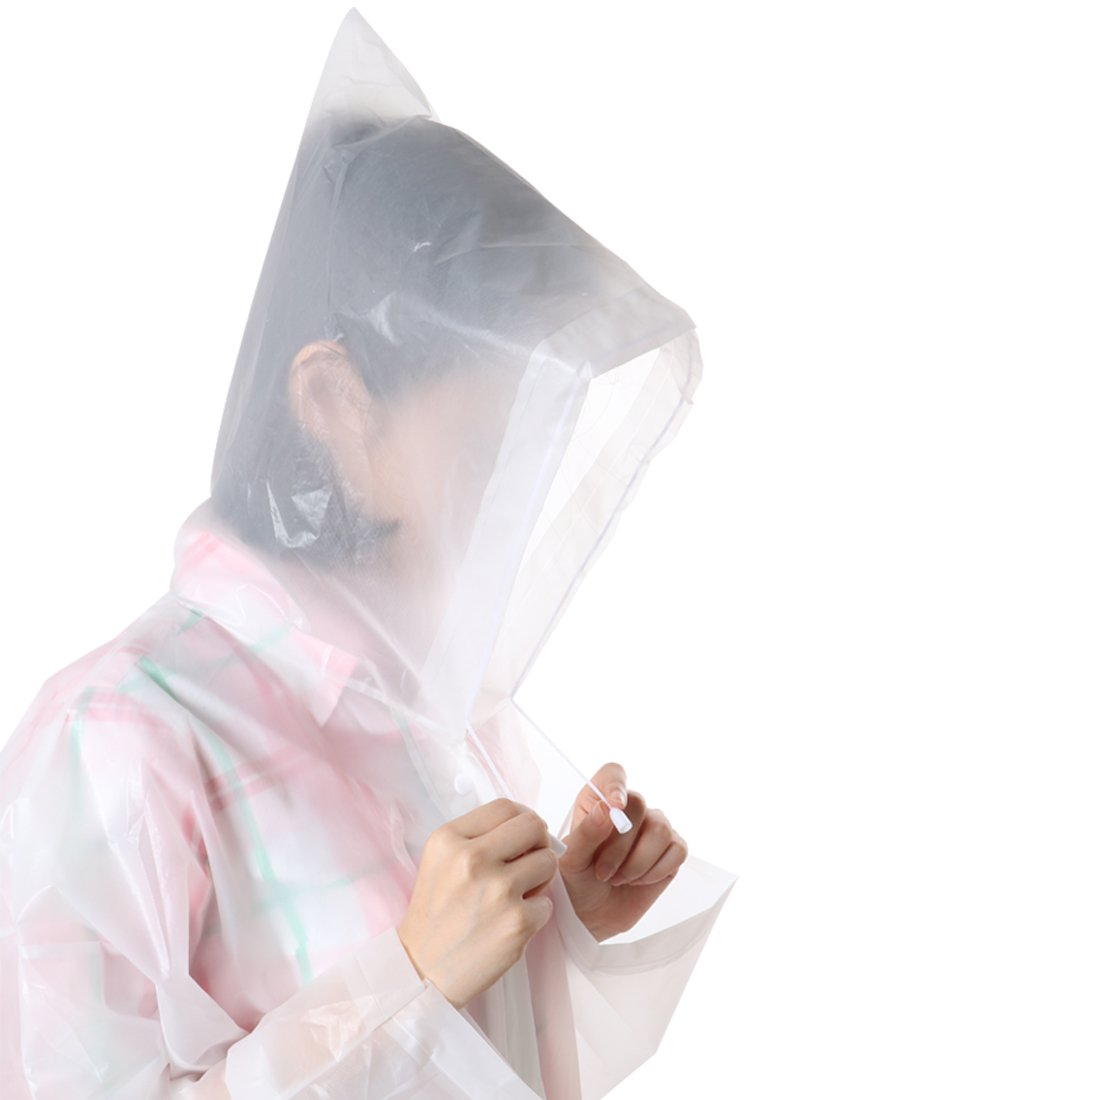 kilofly Waterproof Ultra Light Drawstring Raincoat Long Sleeve Hood Rain Poncho by kilofly (Image #5)